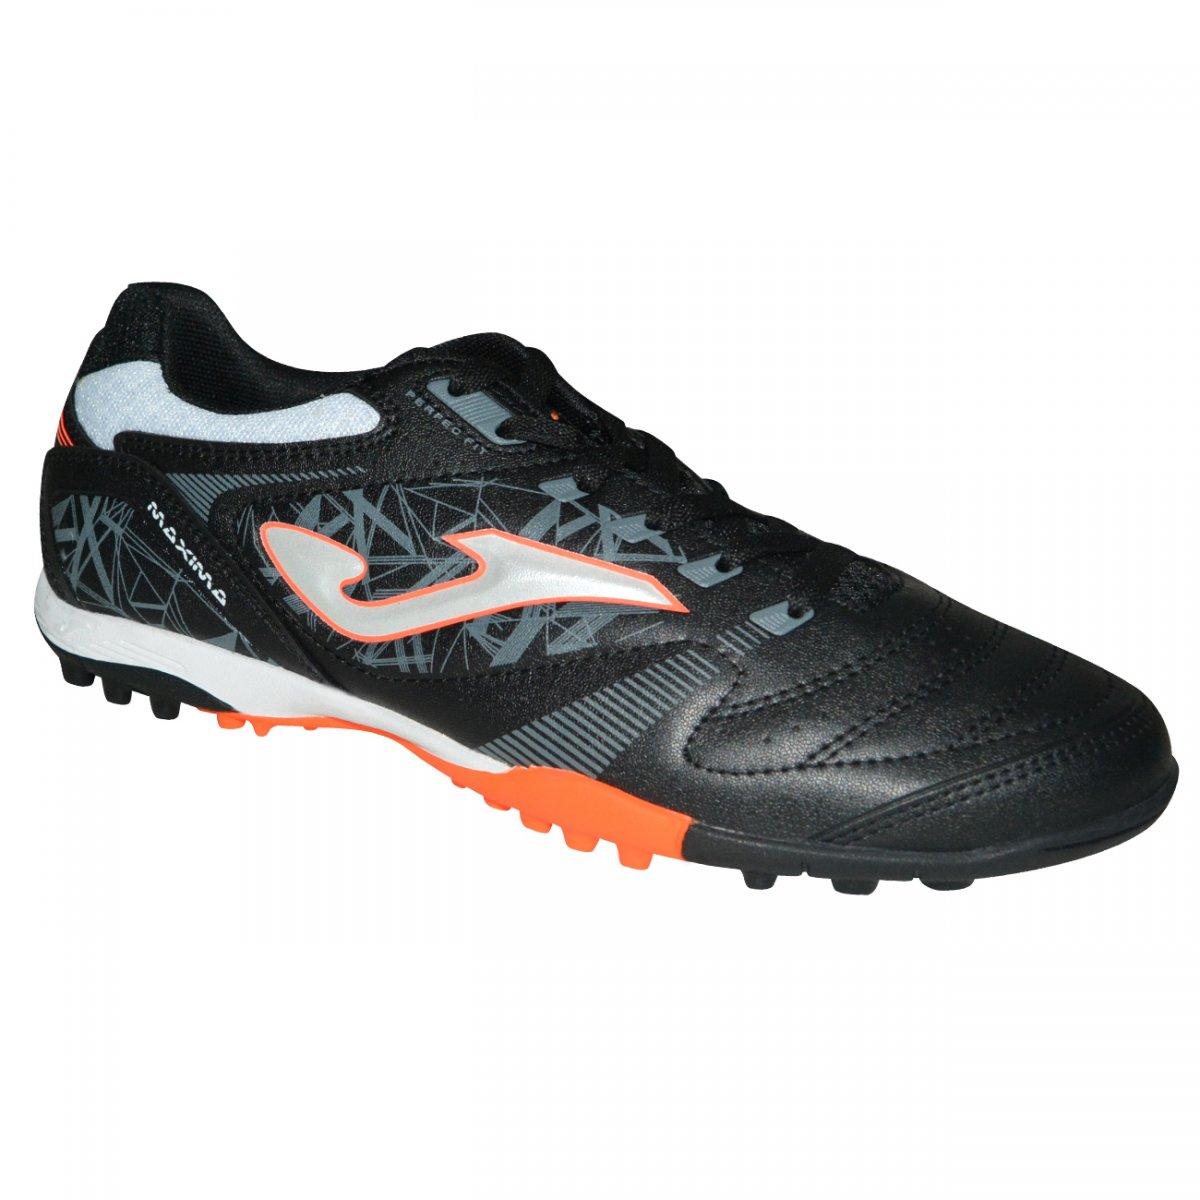 Chuteira Society Joma Maxima 801 MAXS.801.TF - Preto prata - Chuteira Nike cb7f9e3000606